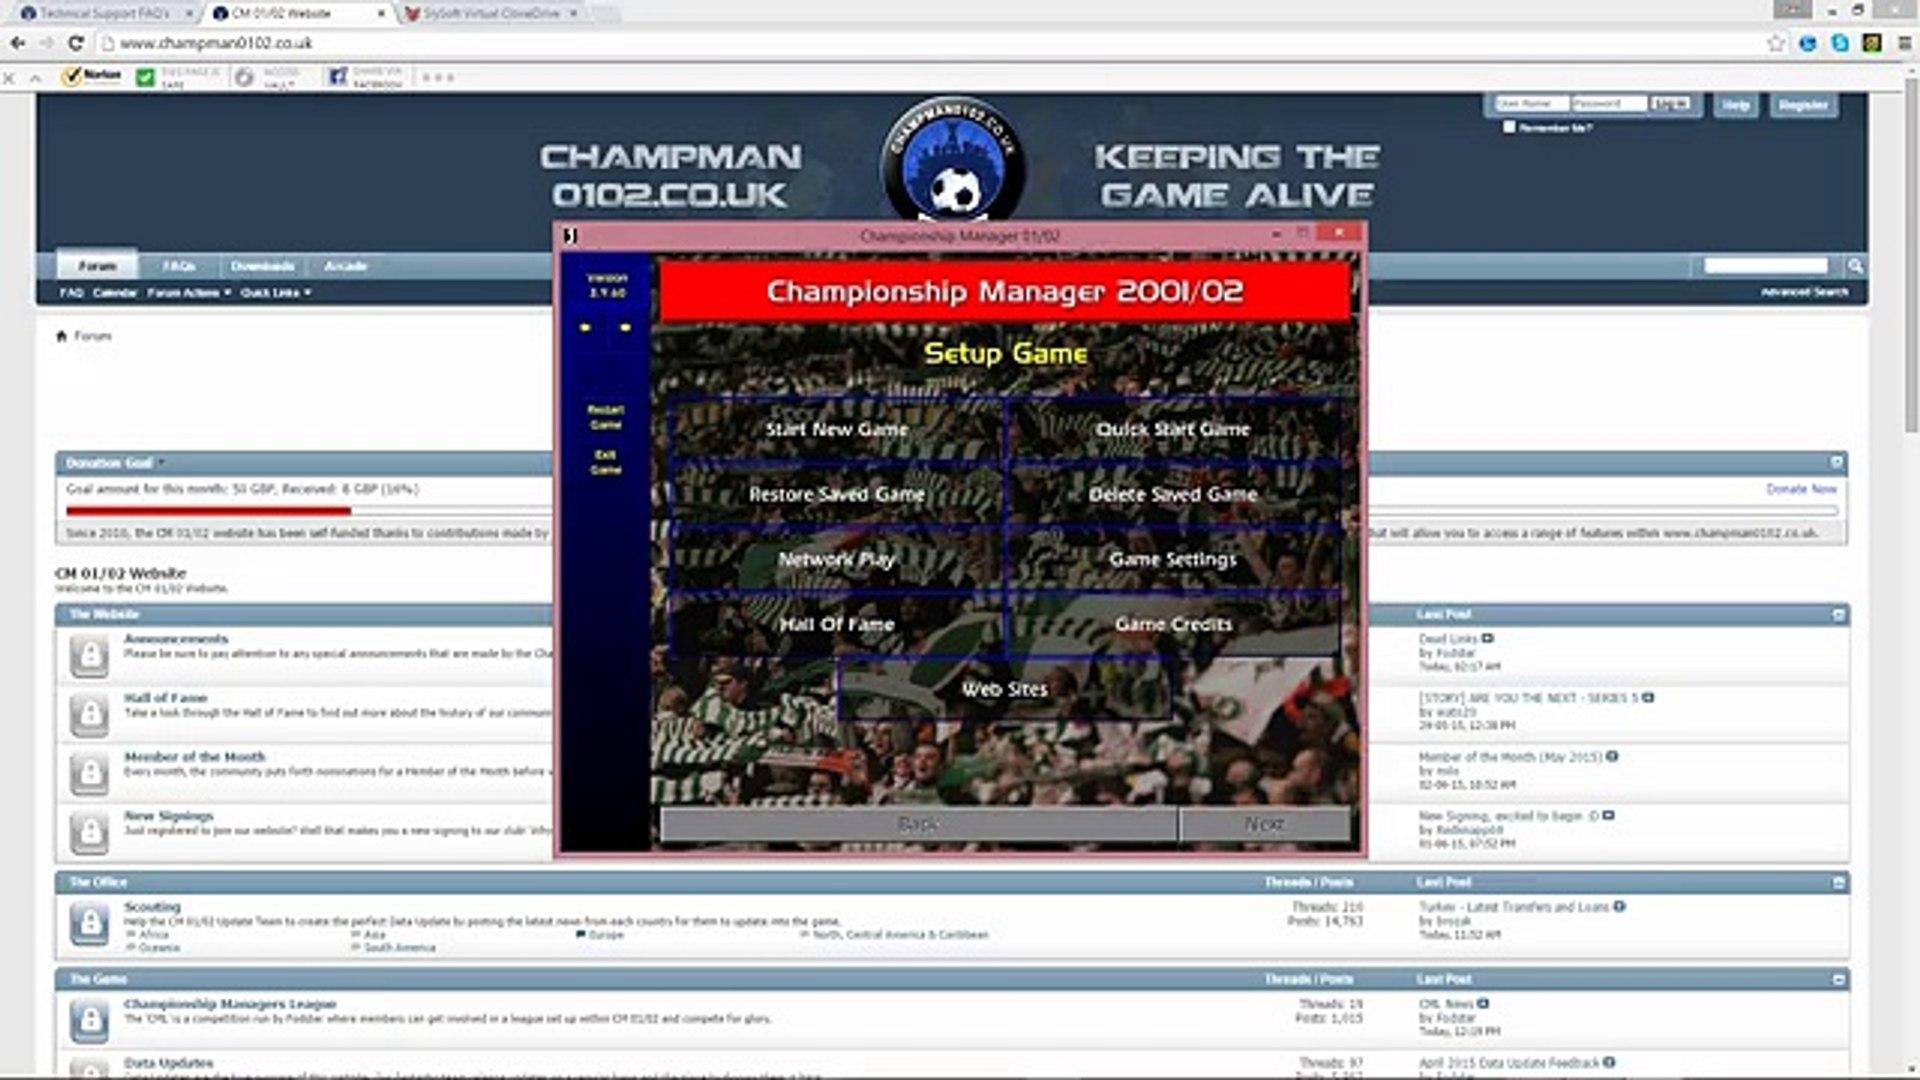 microsoft applocale windows 7 64 bit download